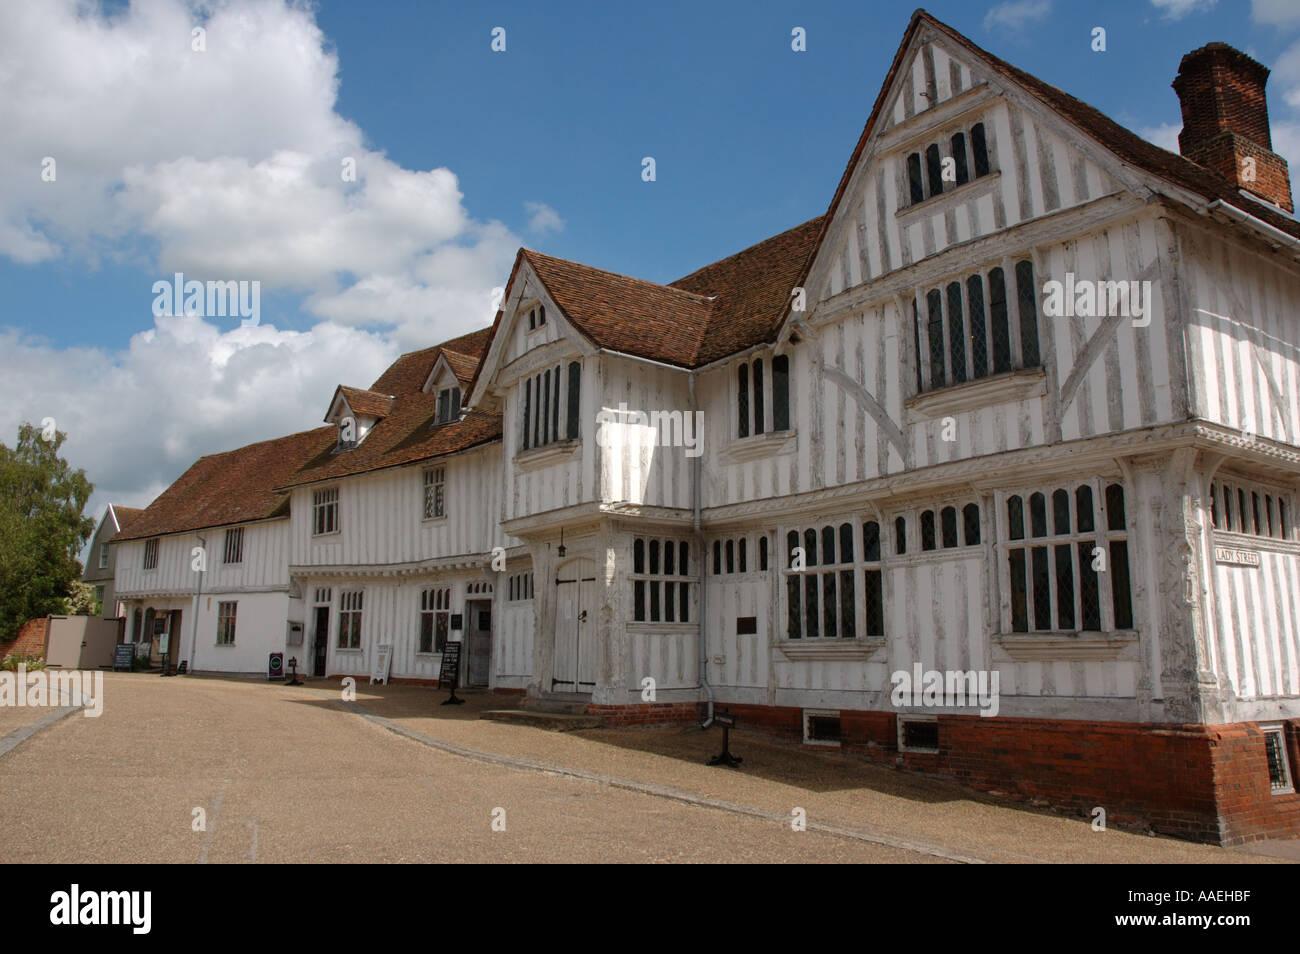 Lavenham Guildhall, Suffolk, UK Stock Photo